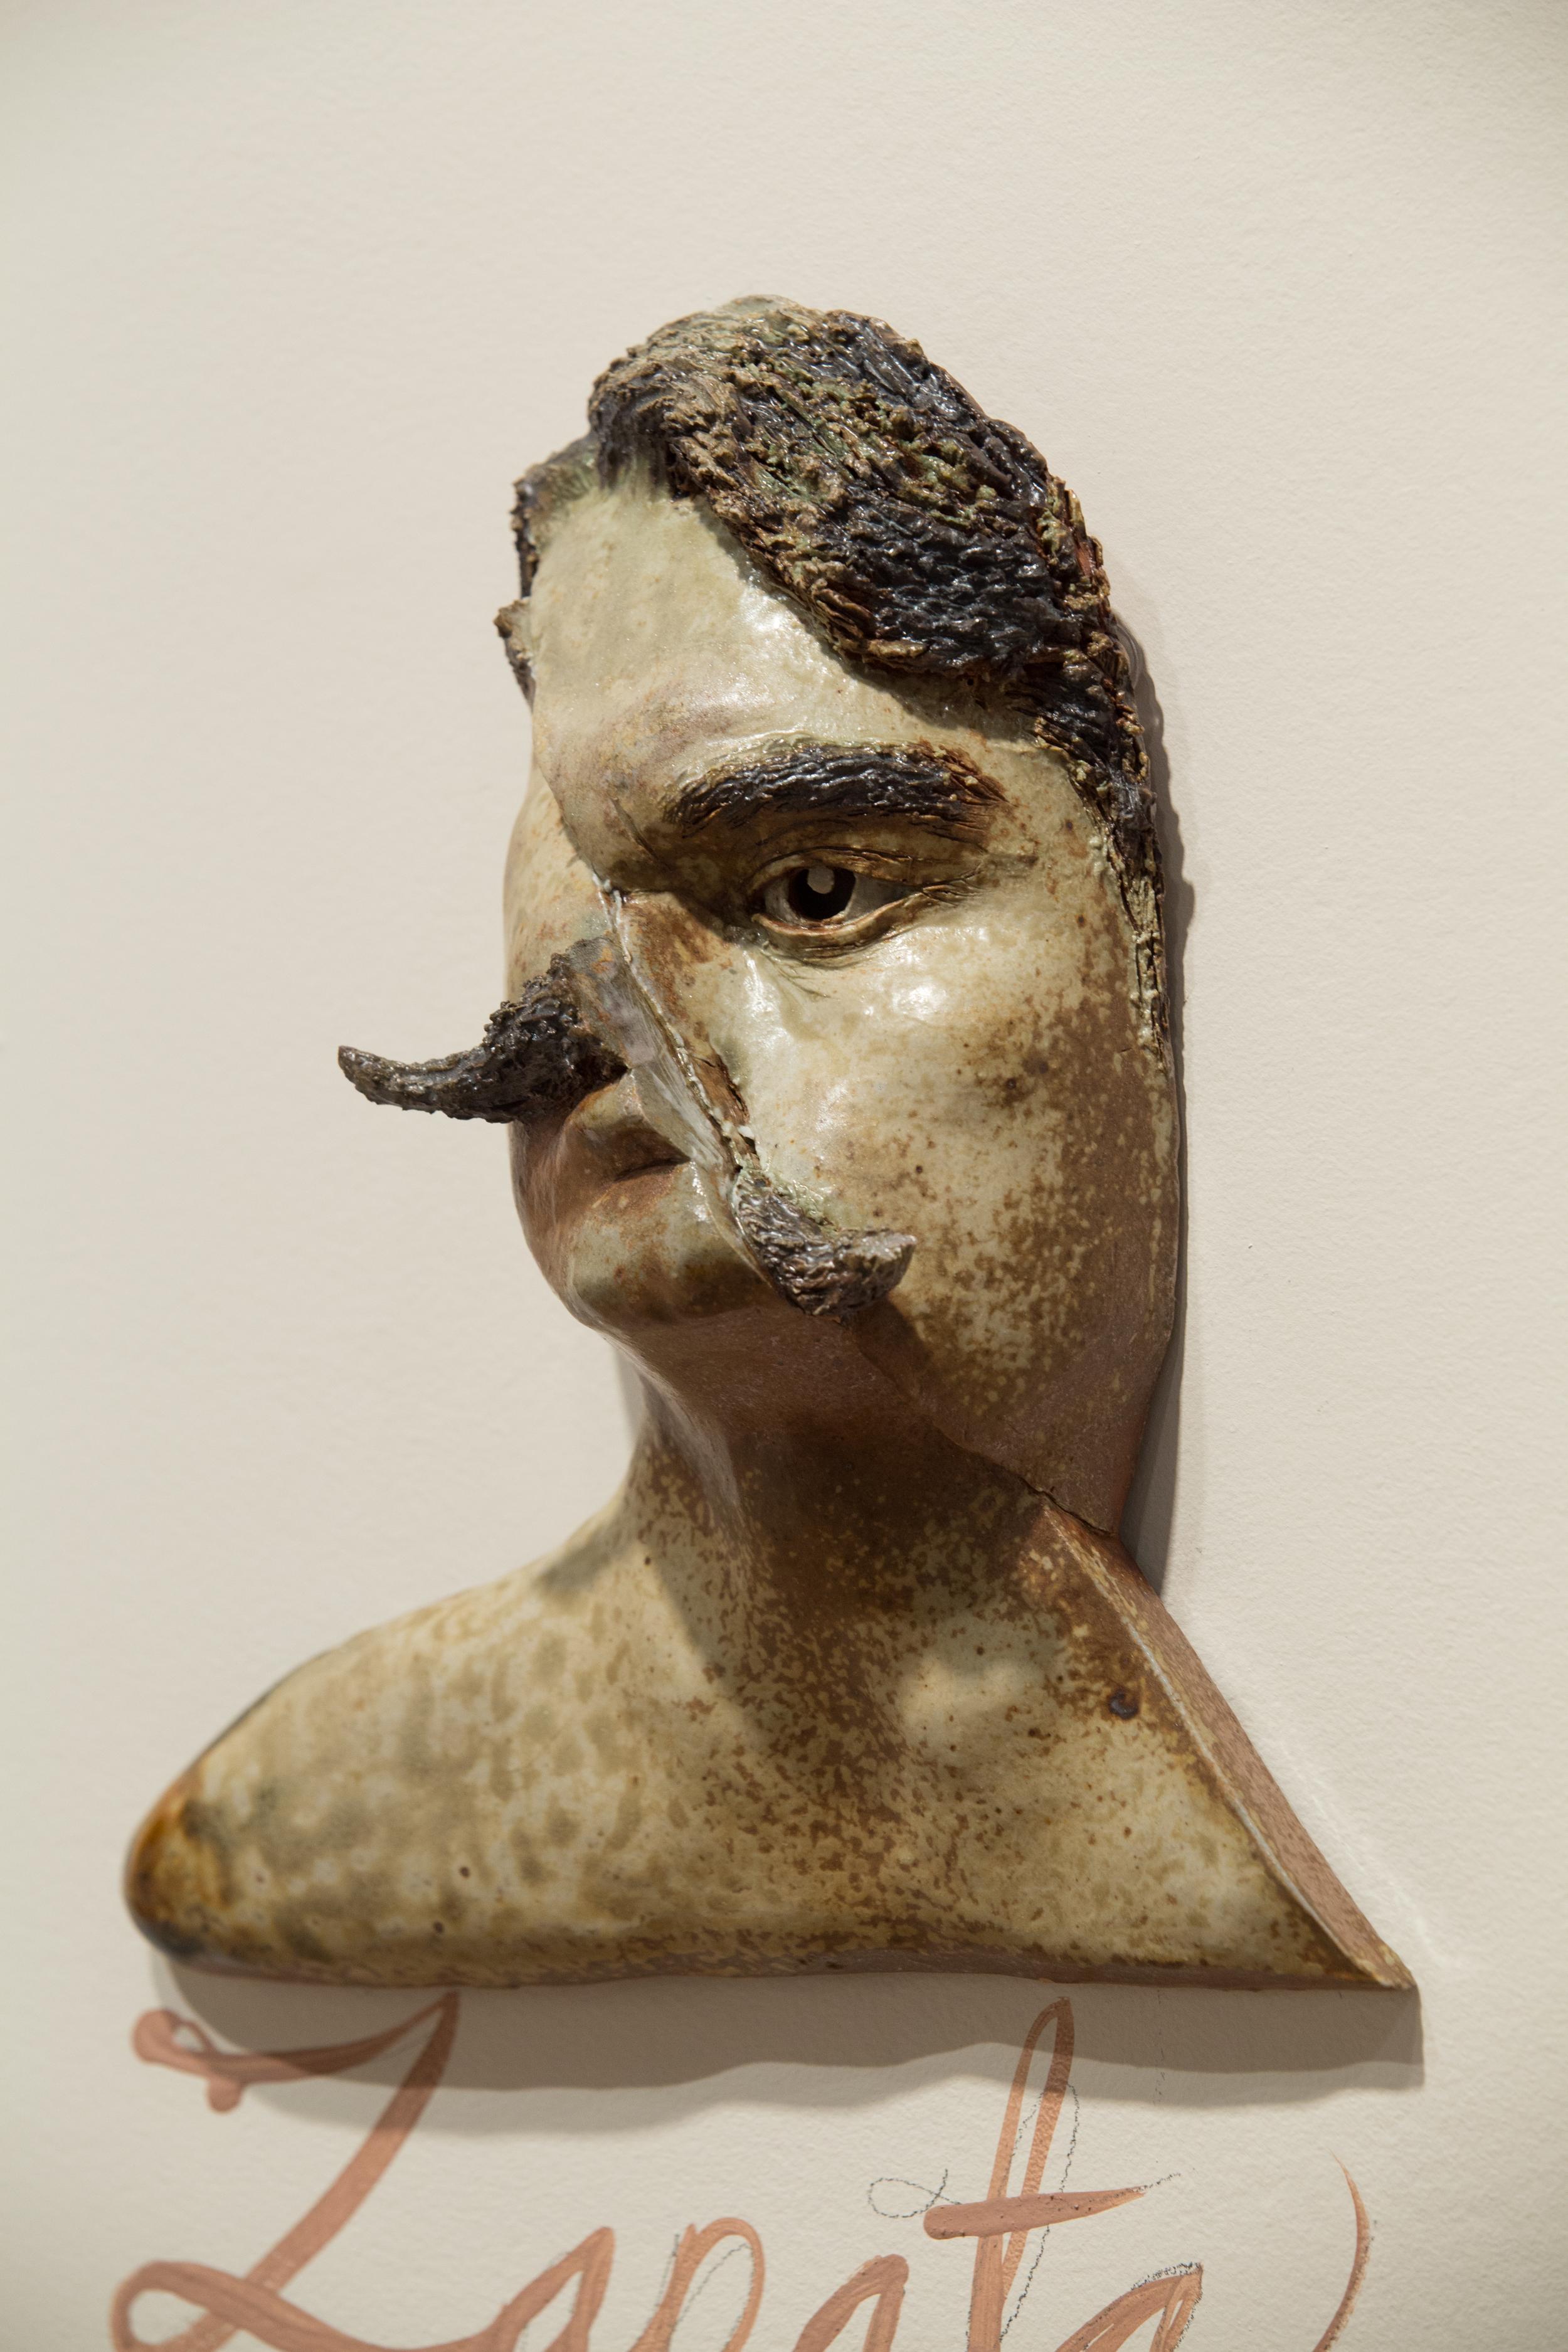 Zapata Disfigured/Zapata desfigurado